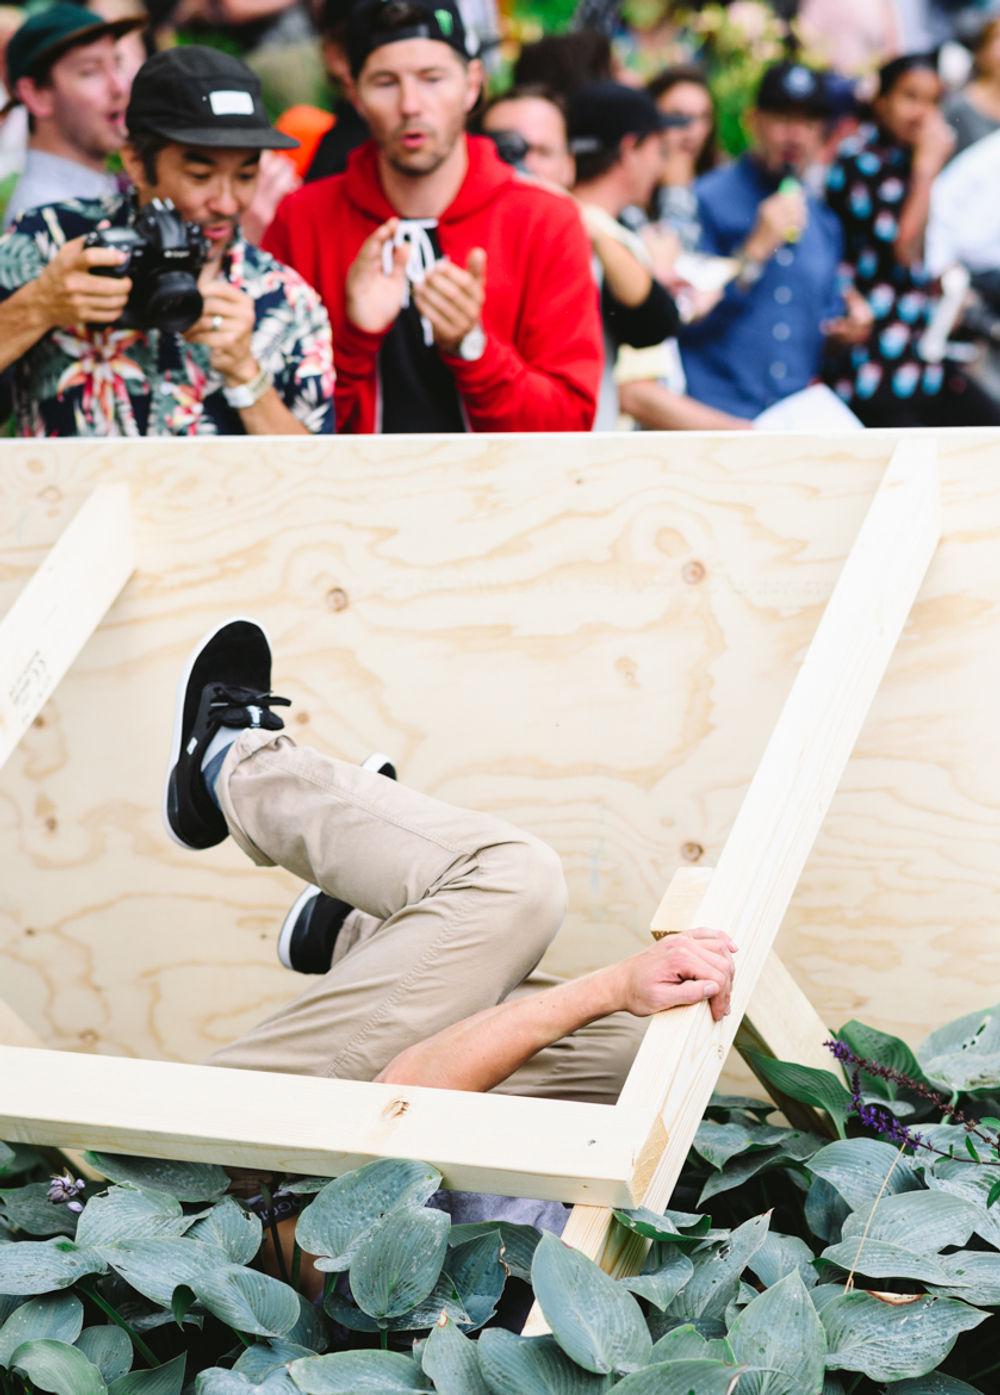 _IHC5323e-Nike-SB-Copenhagen-Open-Day-4-July-2015-Photographer-Maksim-Kalanep